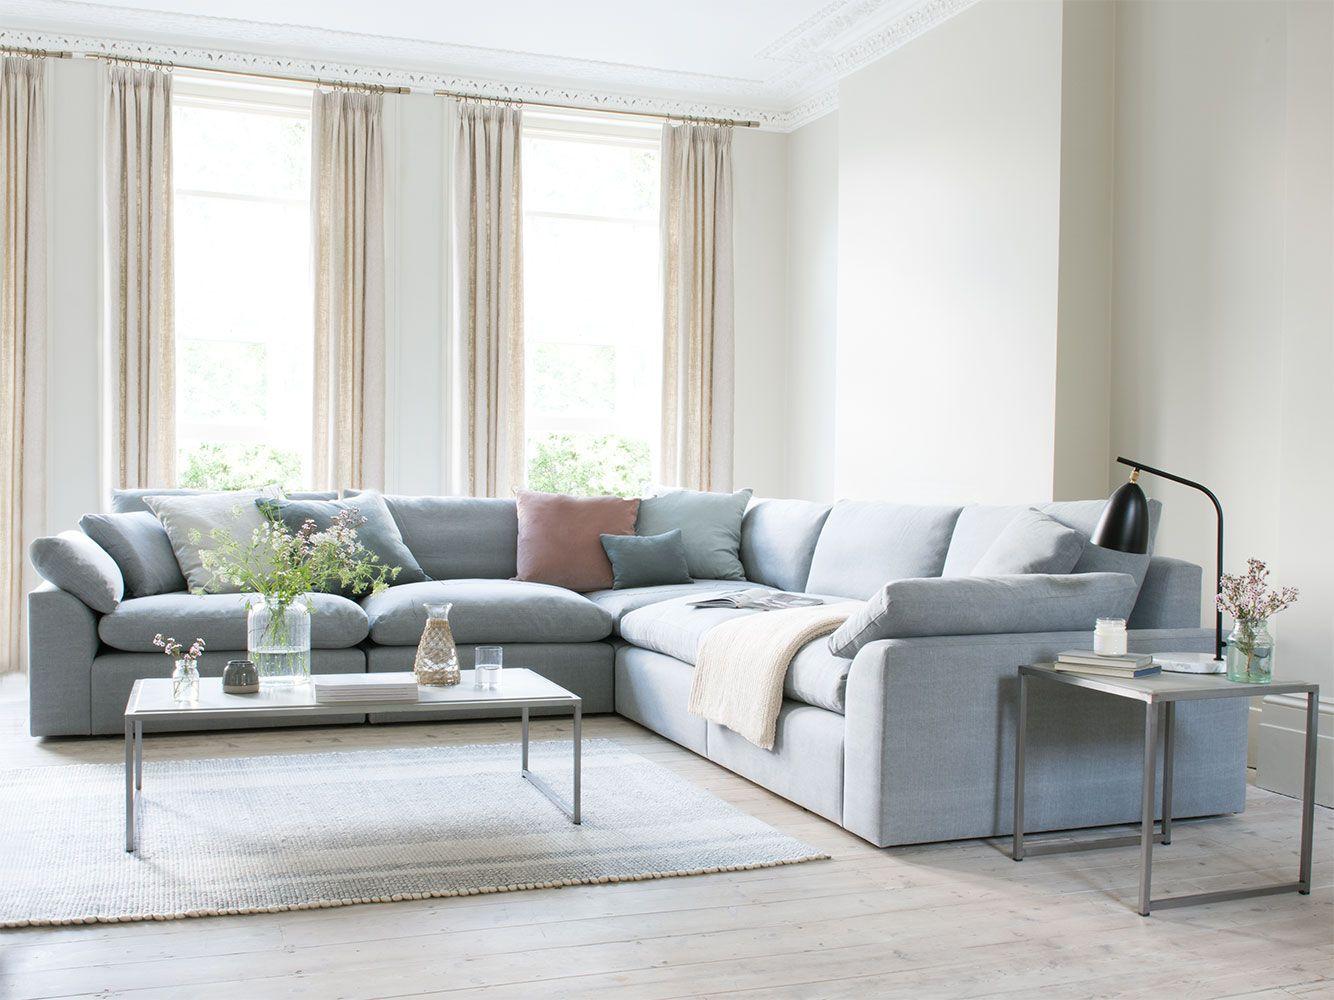 Cuddlemuffin Modular Corner Sofa Modular Corner Sofa Comfy Corner Sofa Living Room Sofa